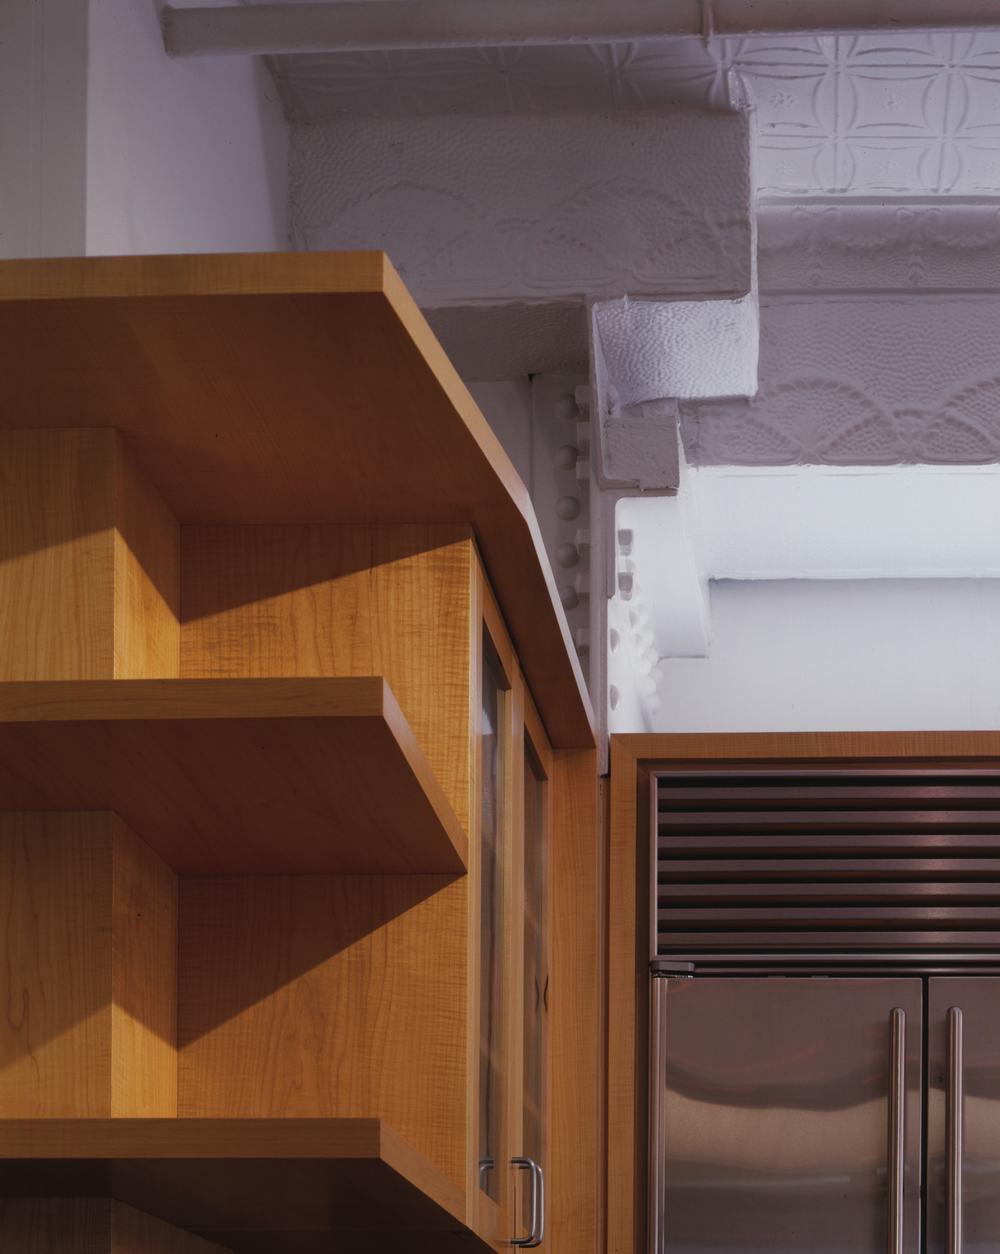 Modern Loft Apartment Renovation | Tribeca Manhattan New York City | Kitchen Built In Custom Millwork Cabinets | RES4